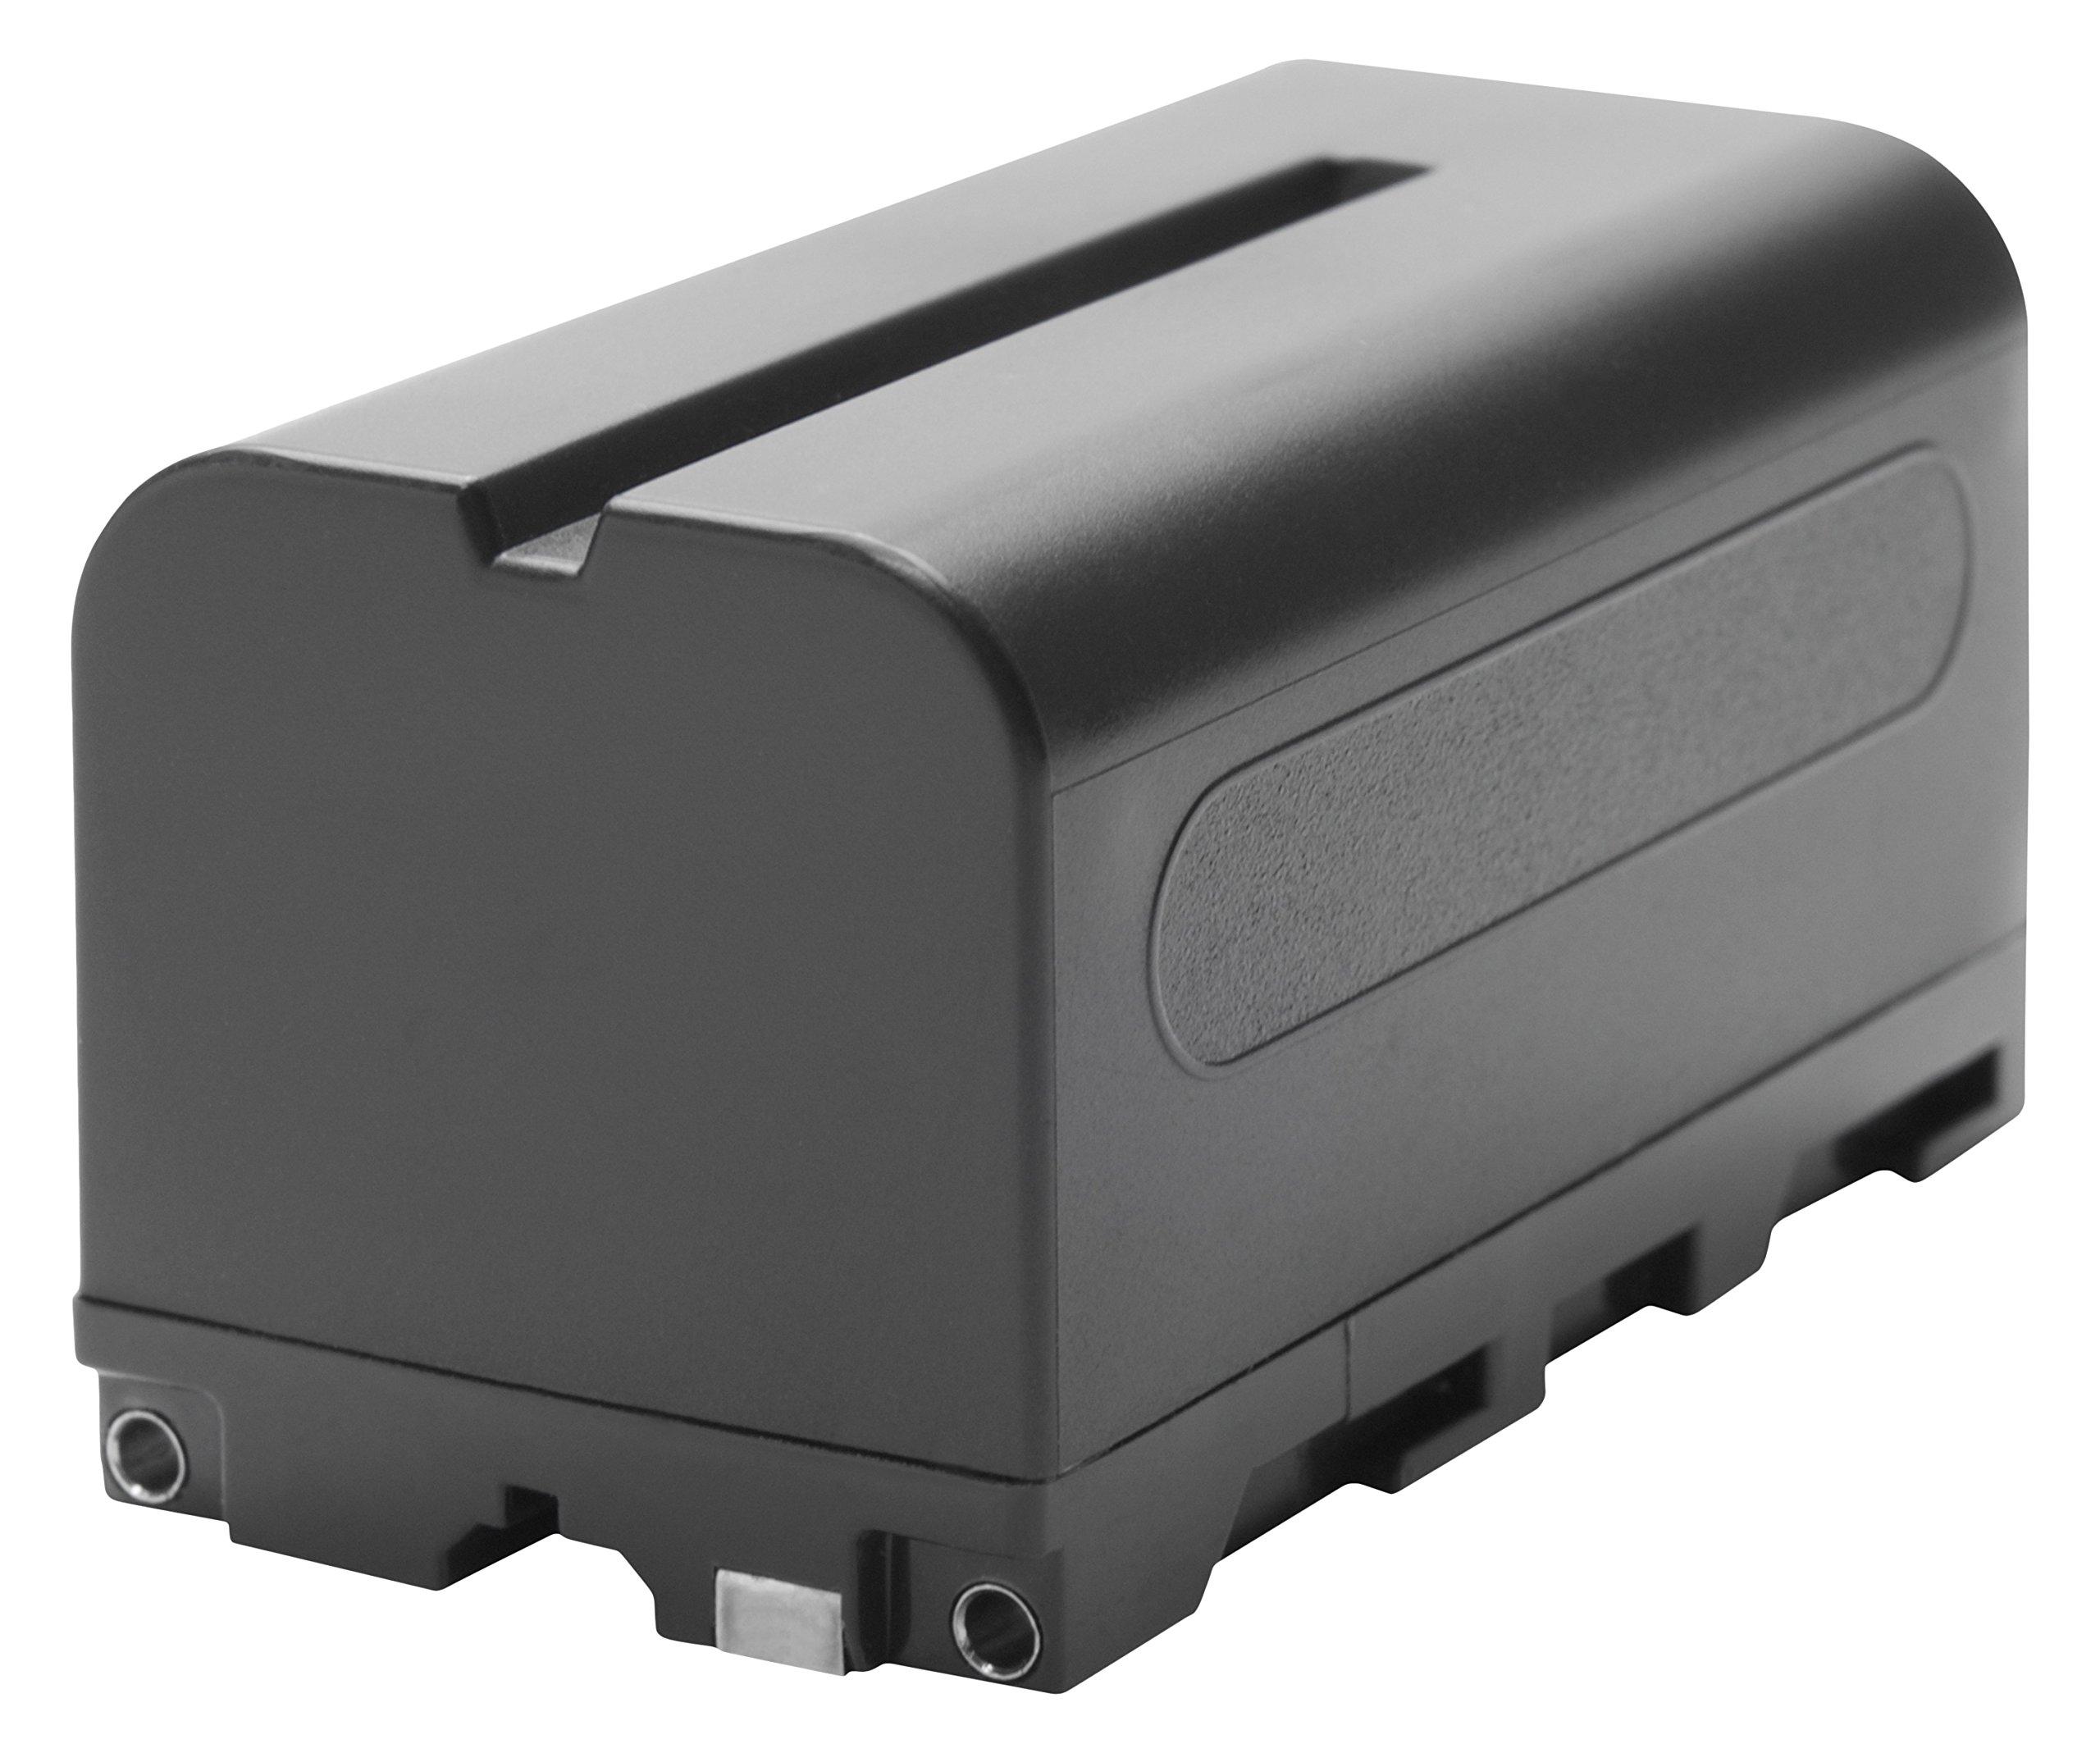 Atomos 5200mAh Battery for Atomos Monitors/Recorders by Atomos